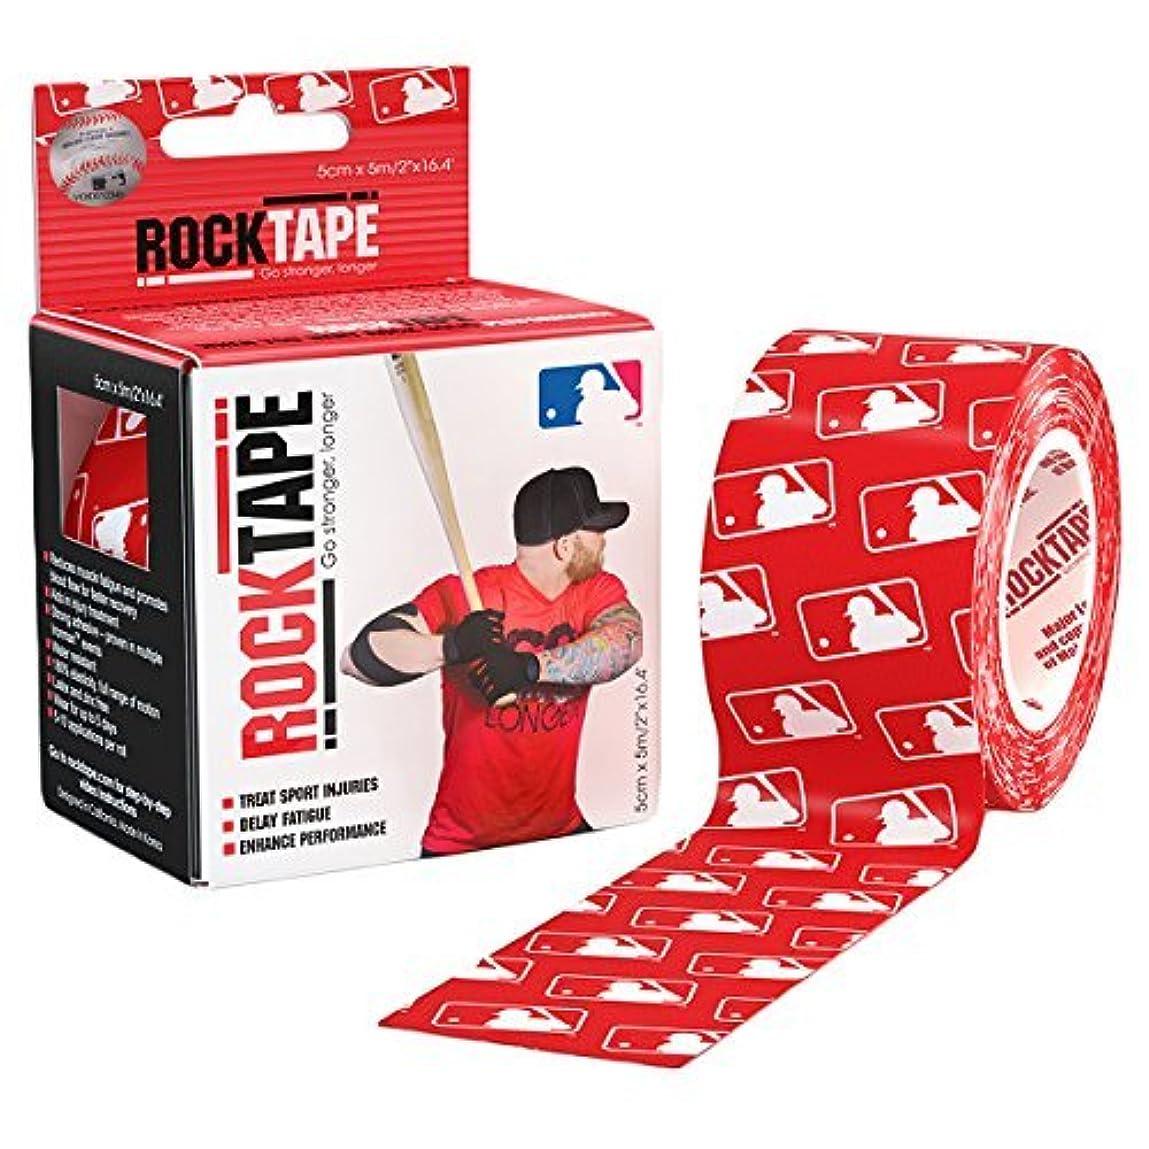 RockTape Original 2-Inch Water-Resistant Kinesiology Tape hx266672648